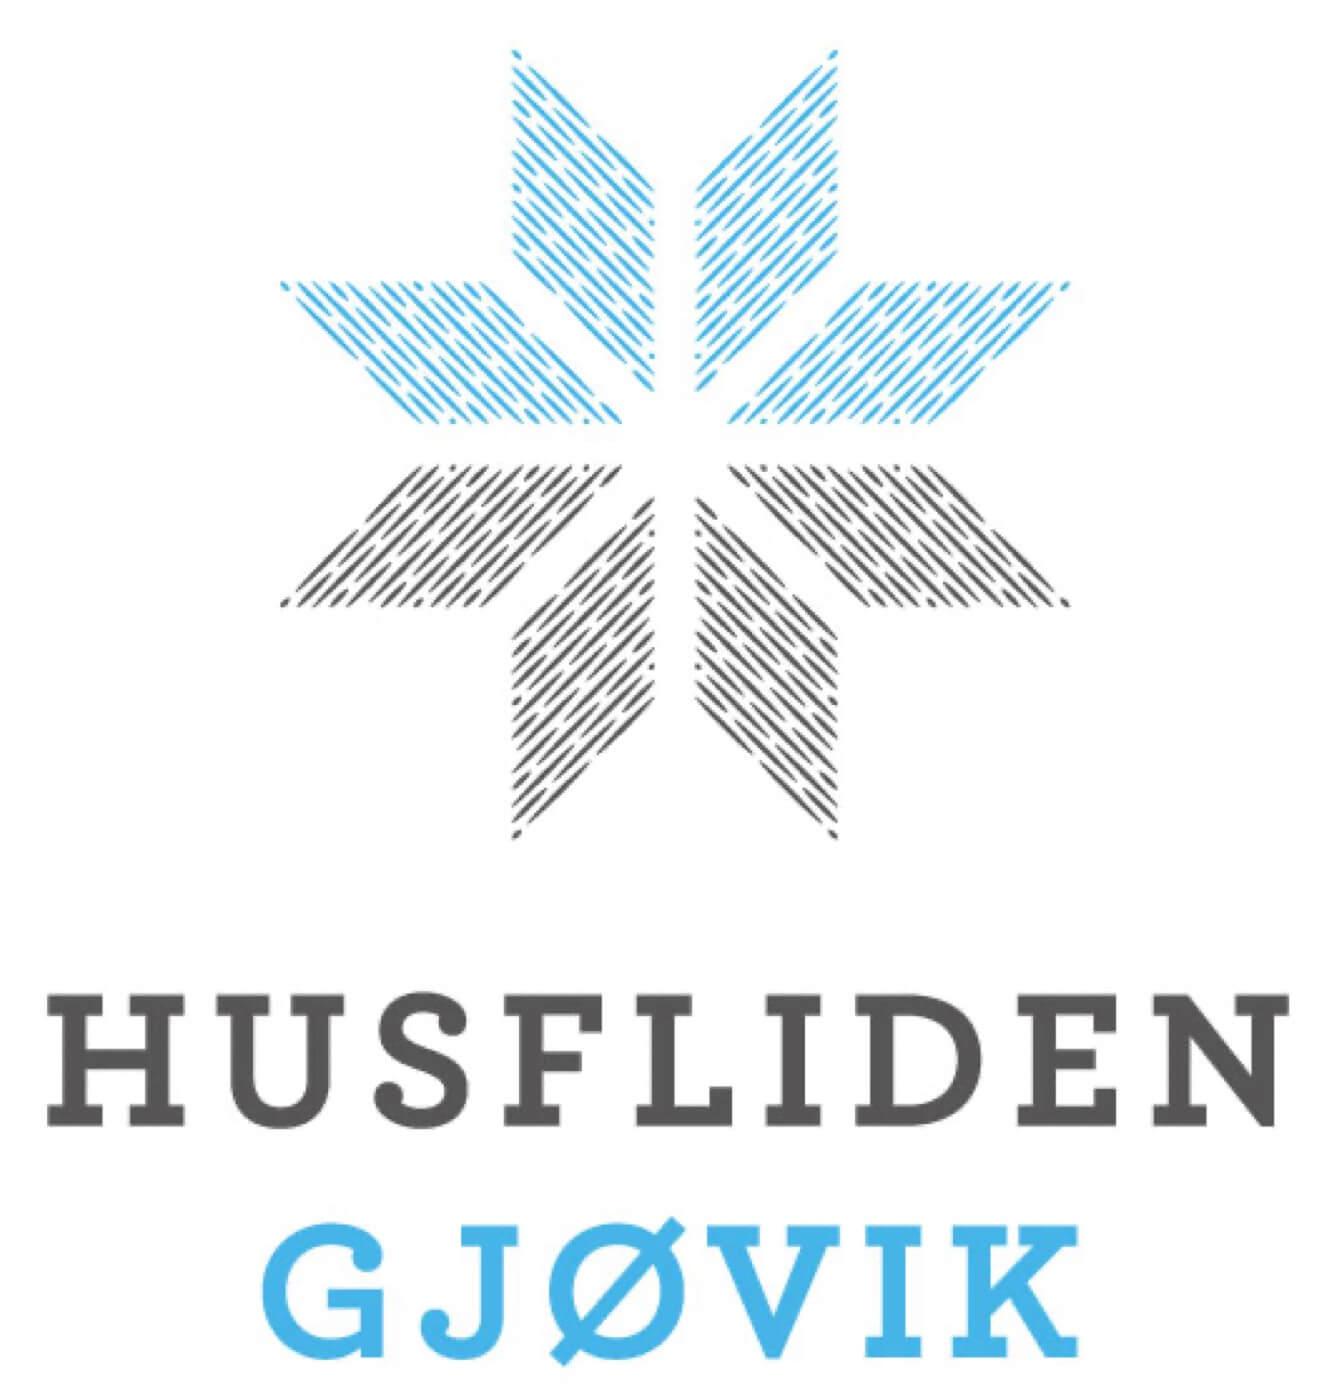 Husfliden Gjøvik